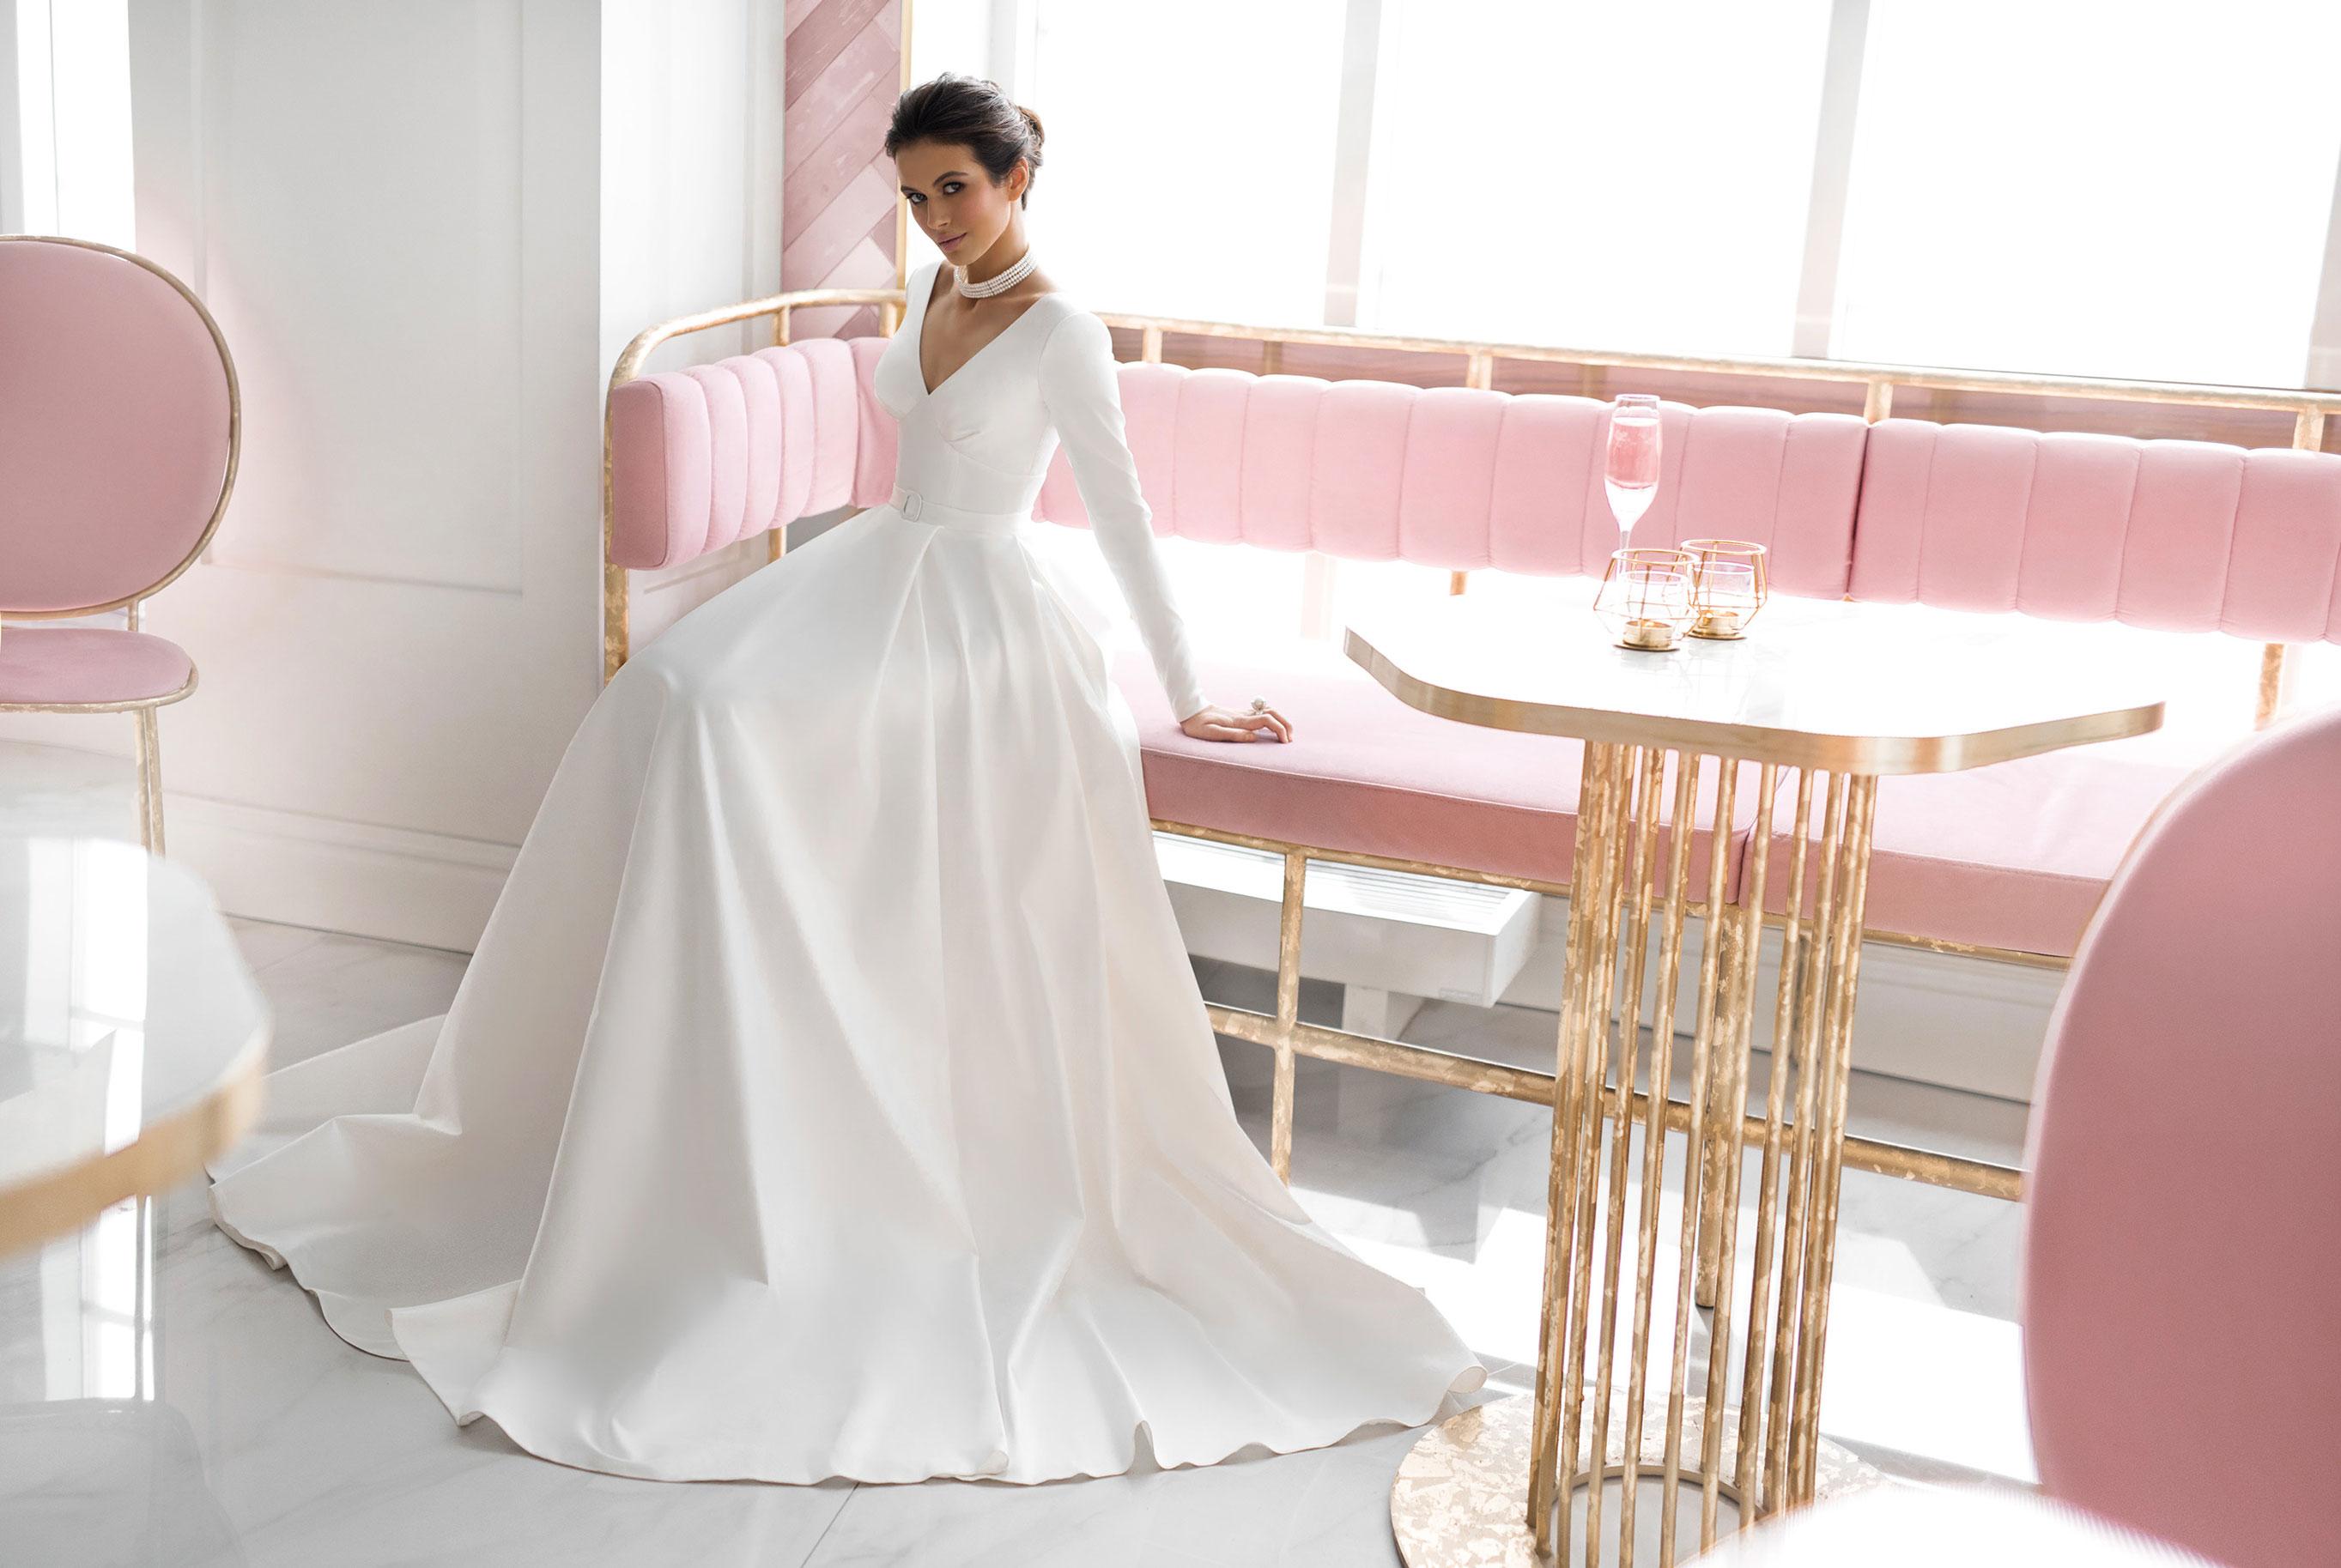 Ксения Саладуха в свадебных нарядах Ave Wedding, весна-лето 2019 / фото 09